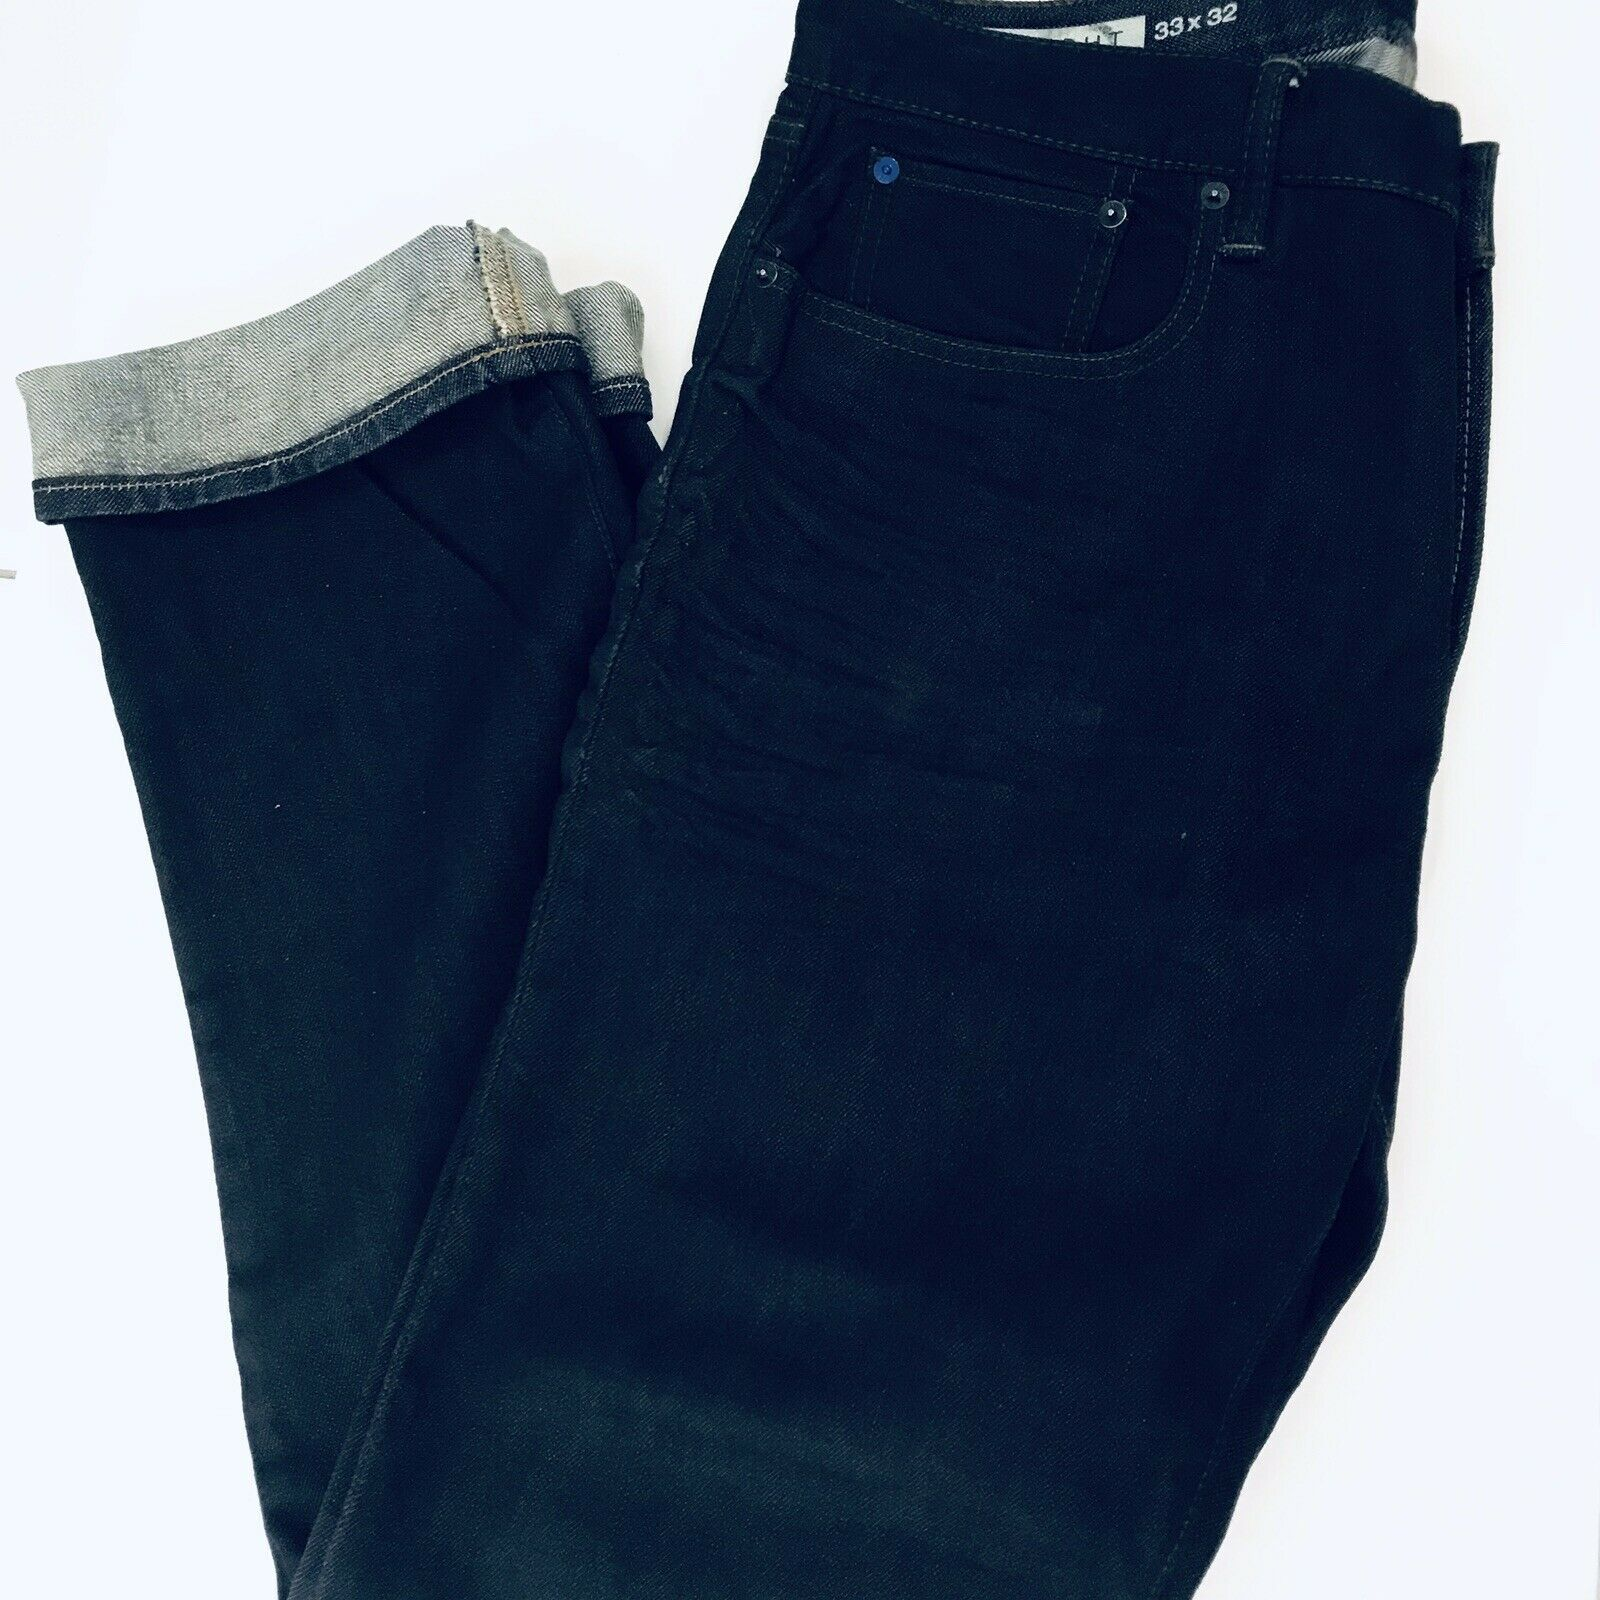 Men's GAP 1969 Jeans Straight Leg 33x32 Dark Wash Ring-Spun Denim Cotton Jeans